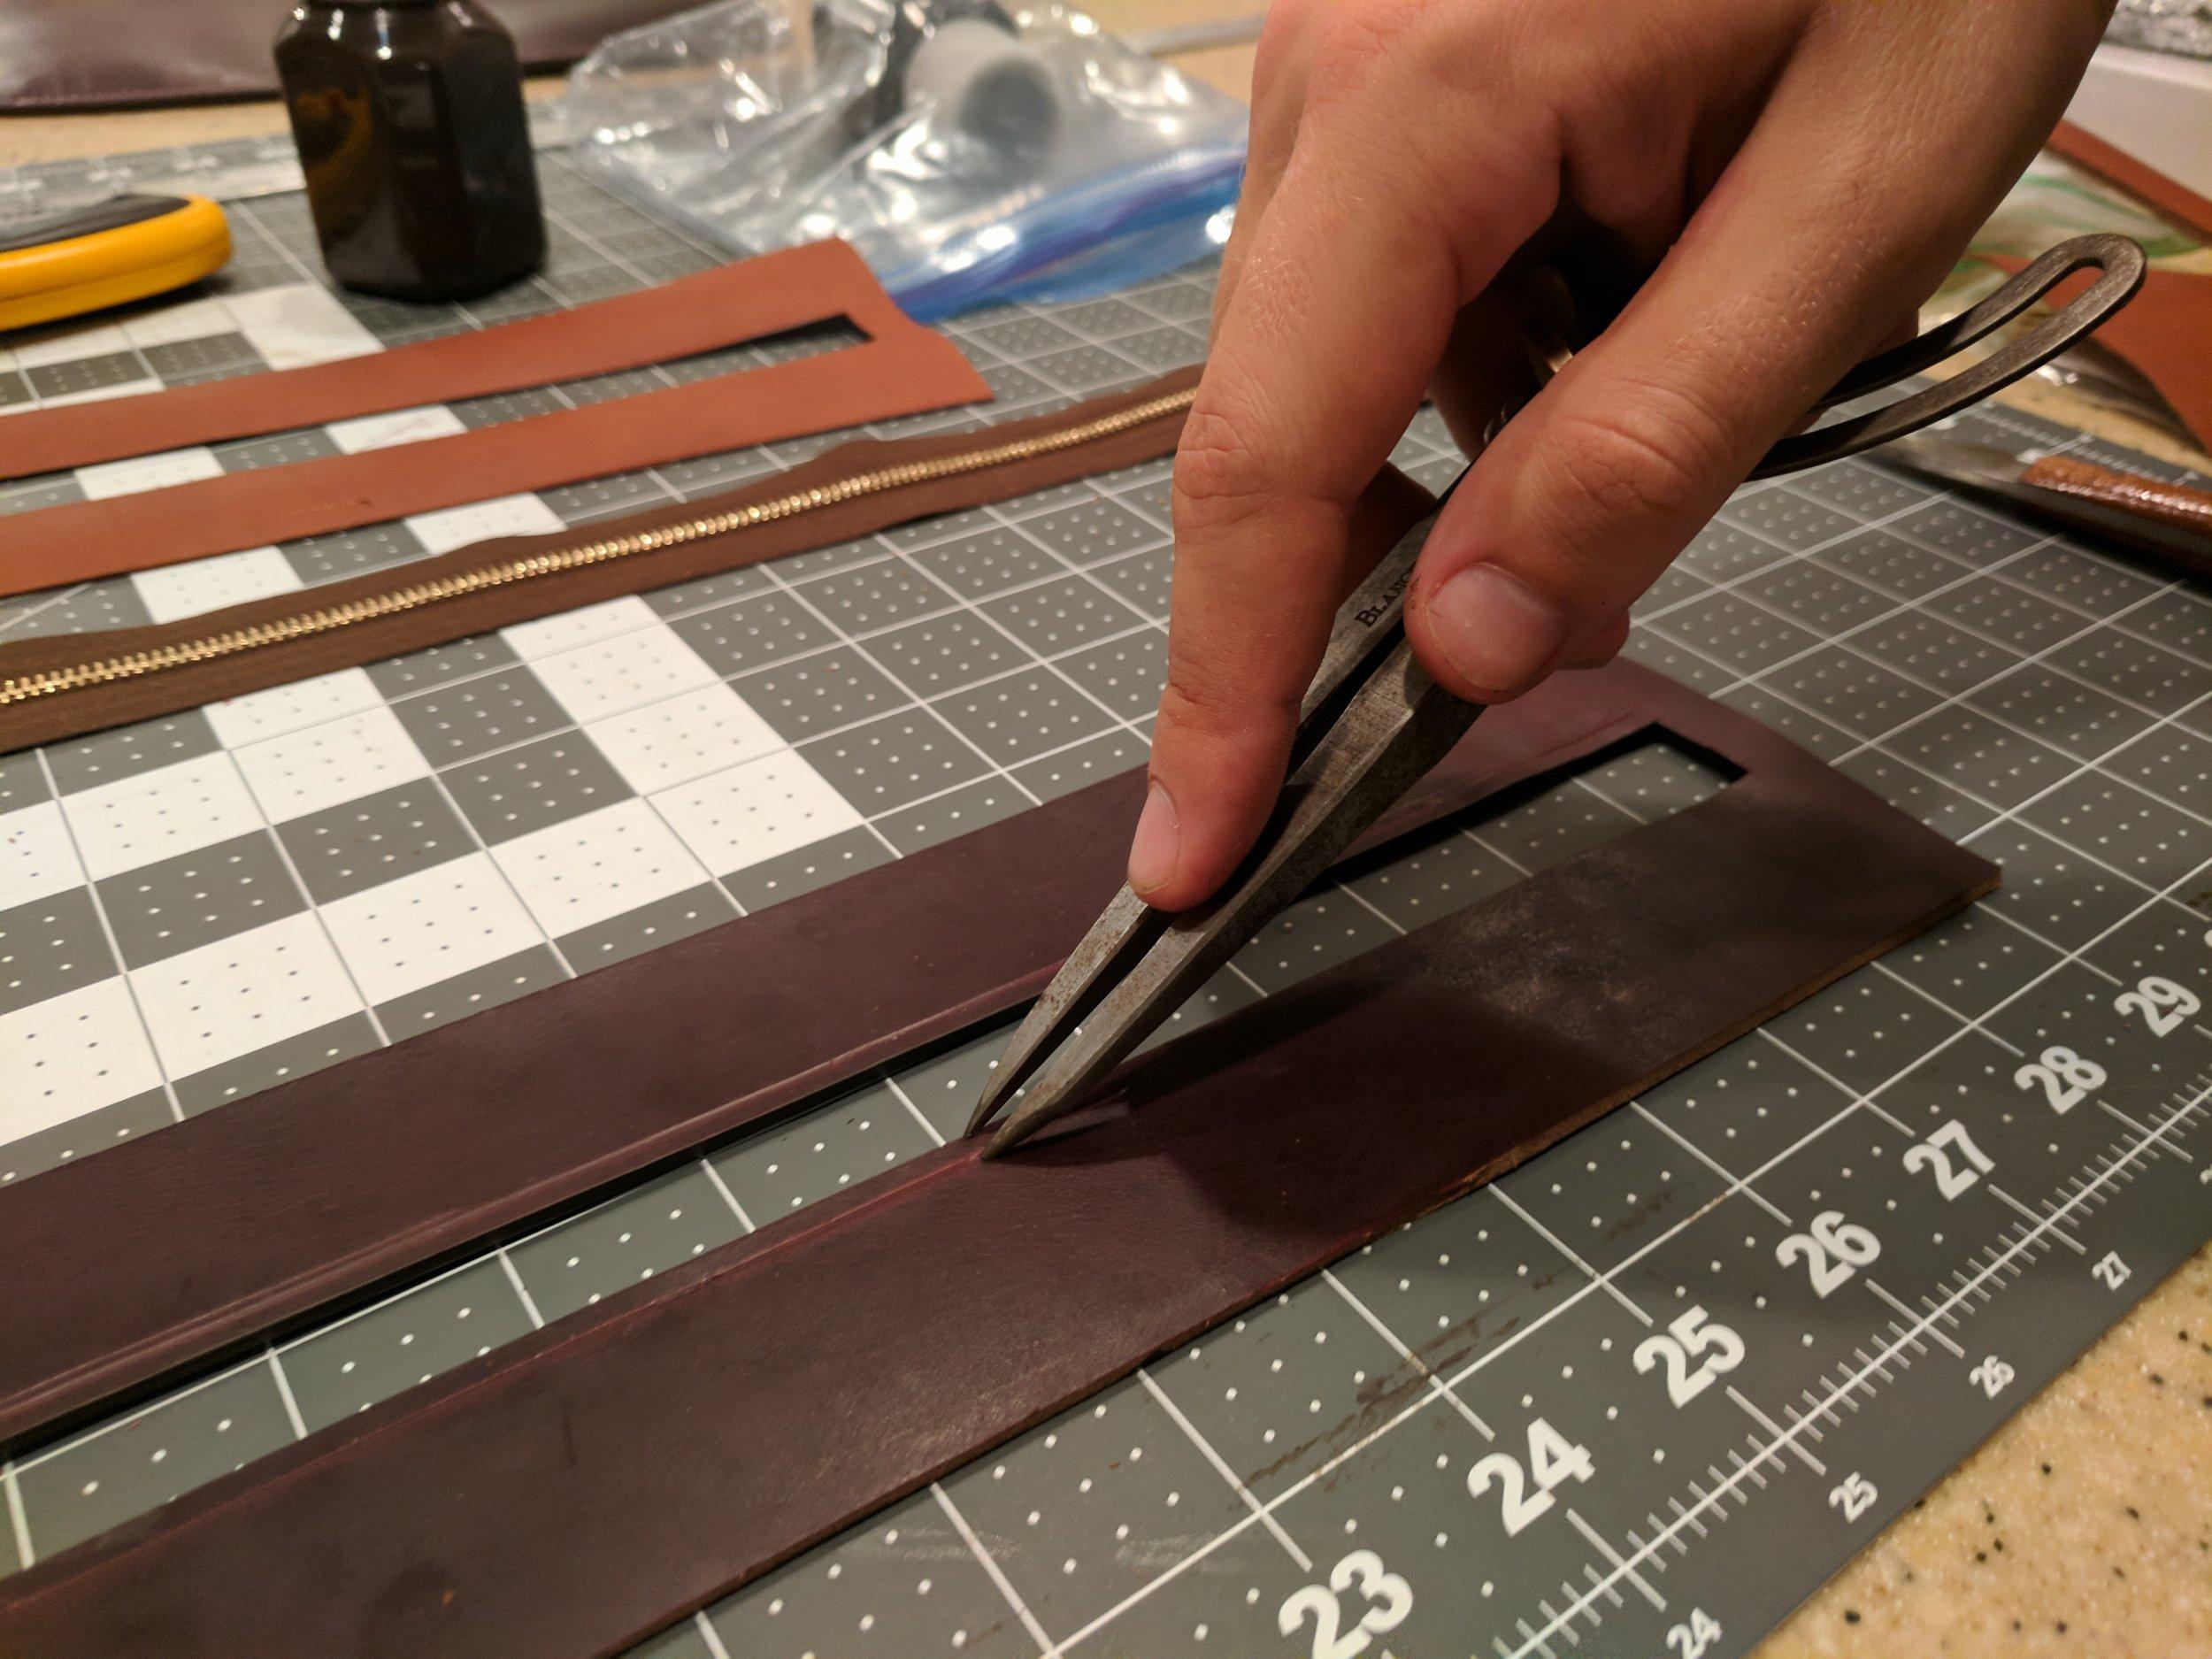 Creating stitching lines